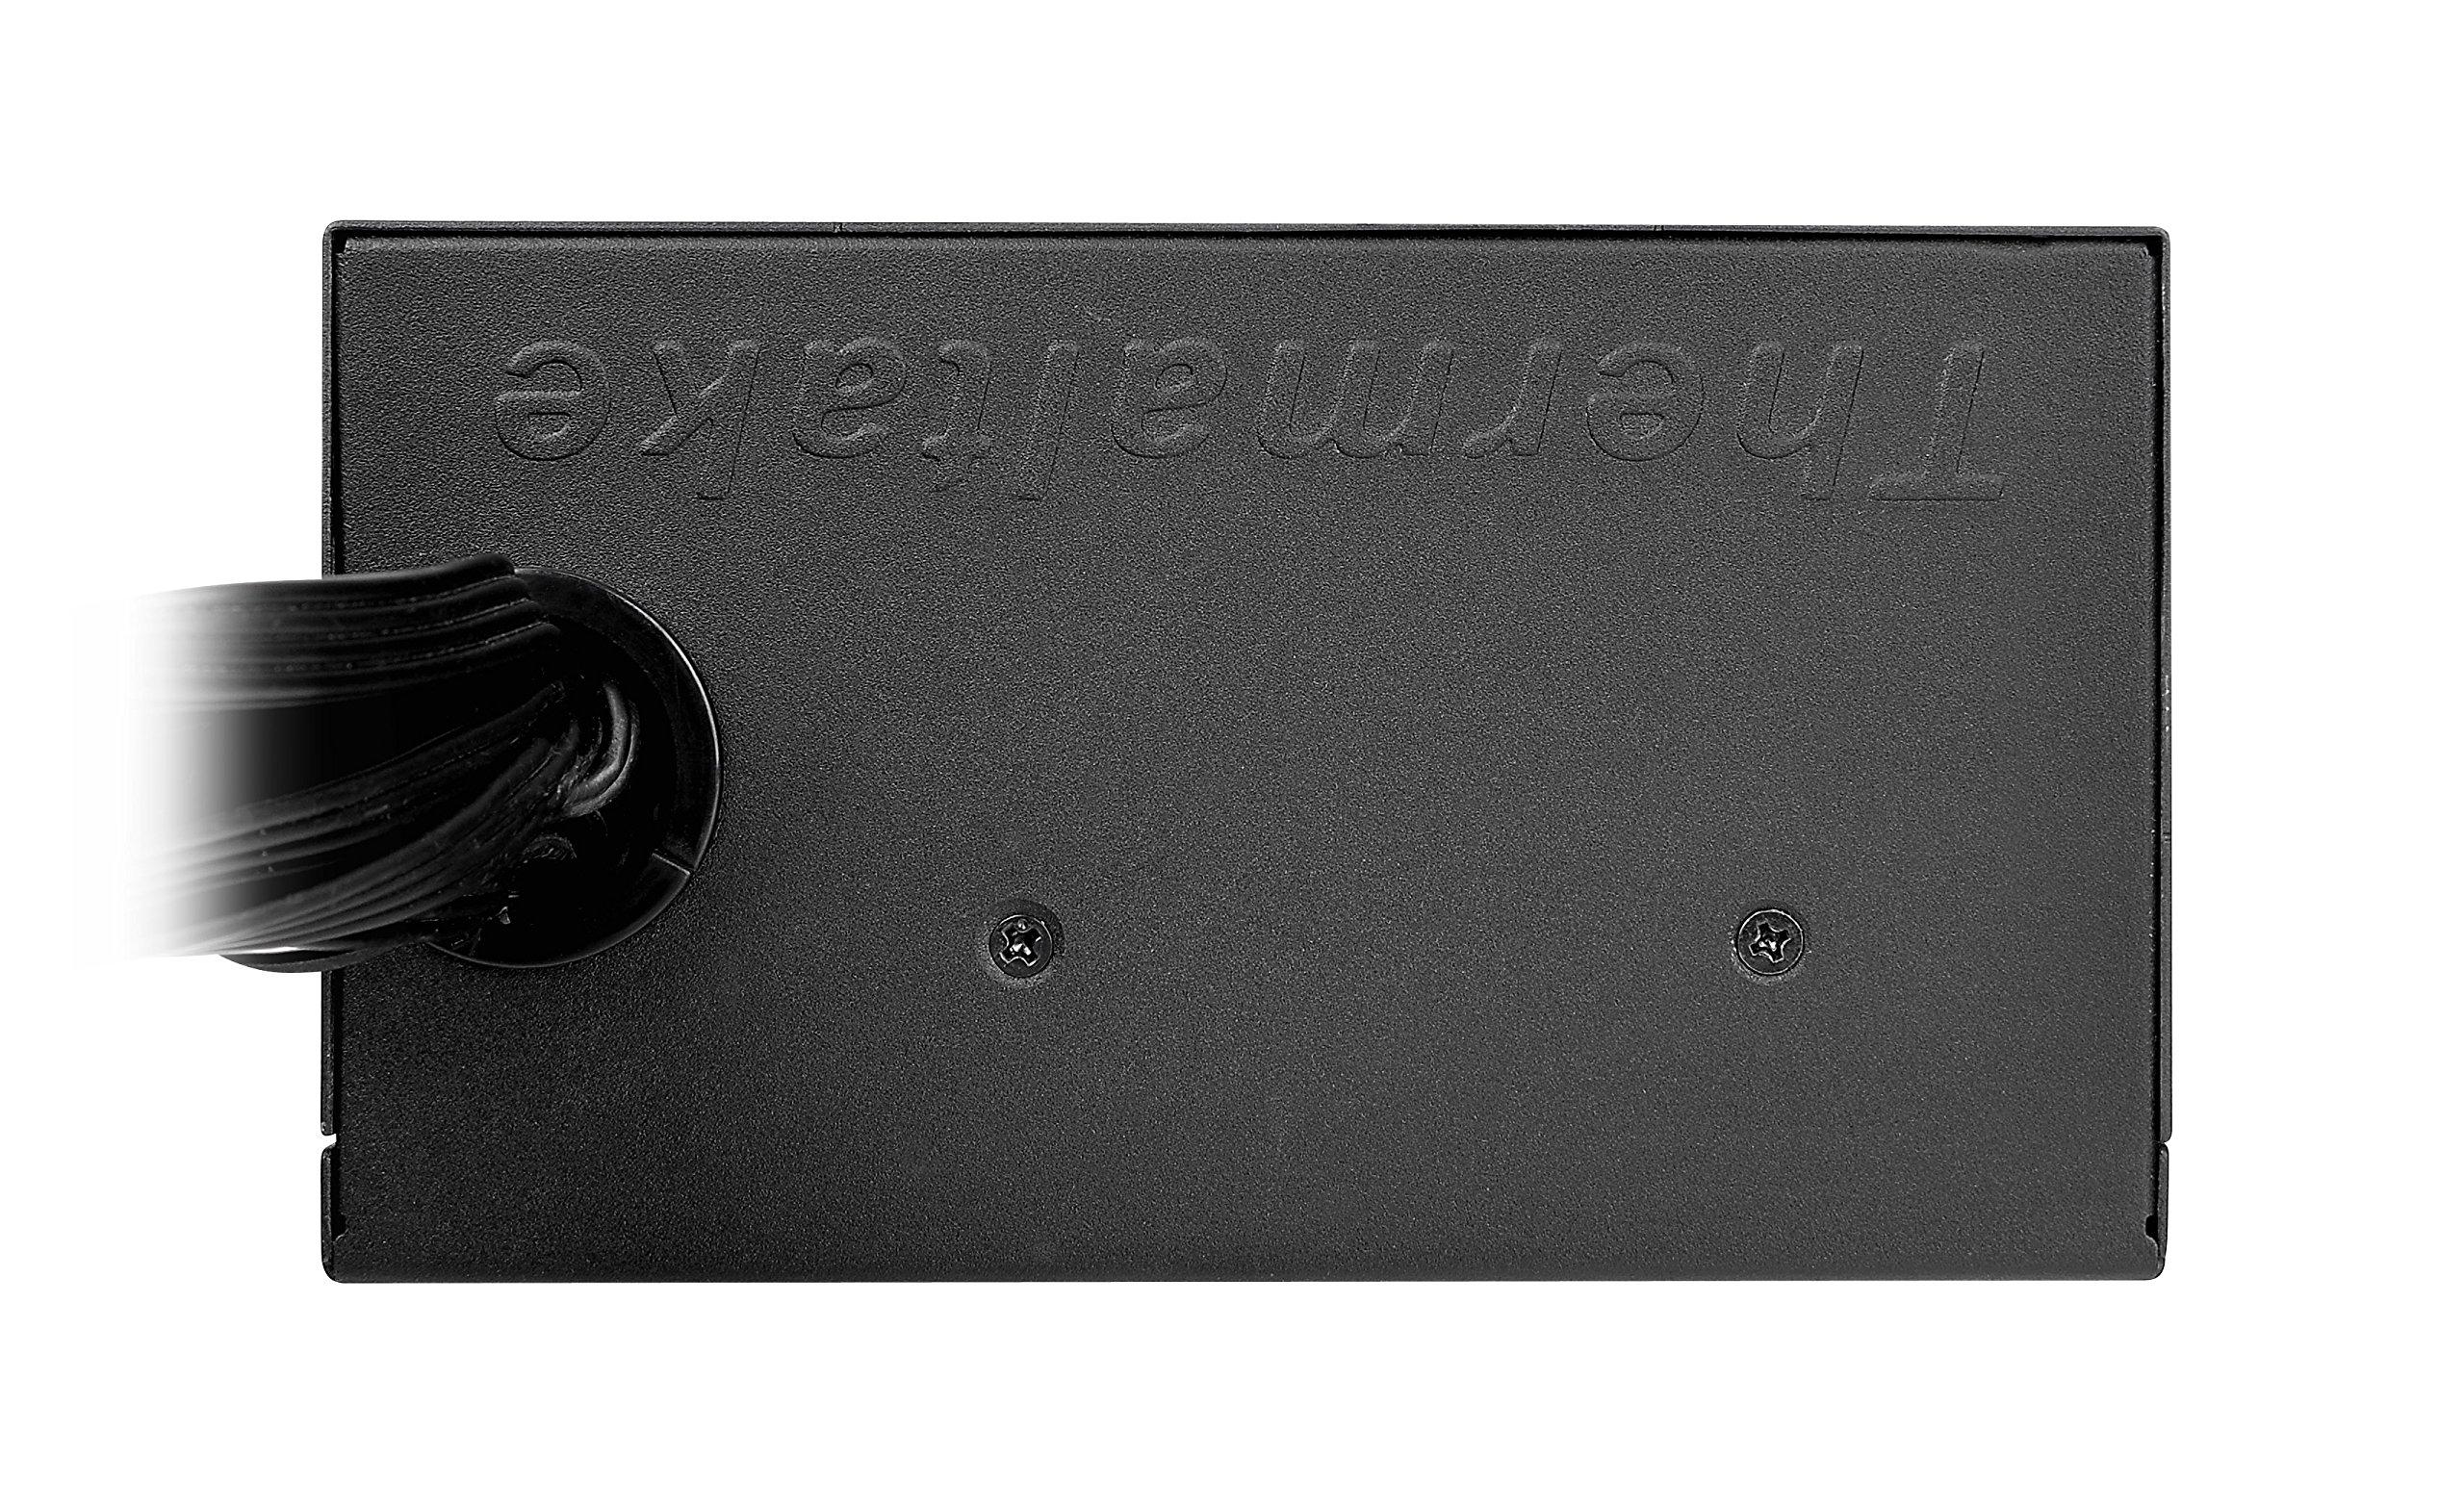 Thermaltake Smart Standard 750W 80 PLUS Bronze ATX12V 2.3 Power Supply SP-750P by Thermaltake (Image #5)